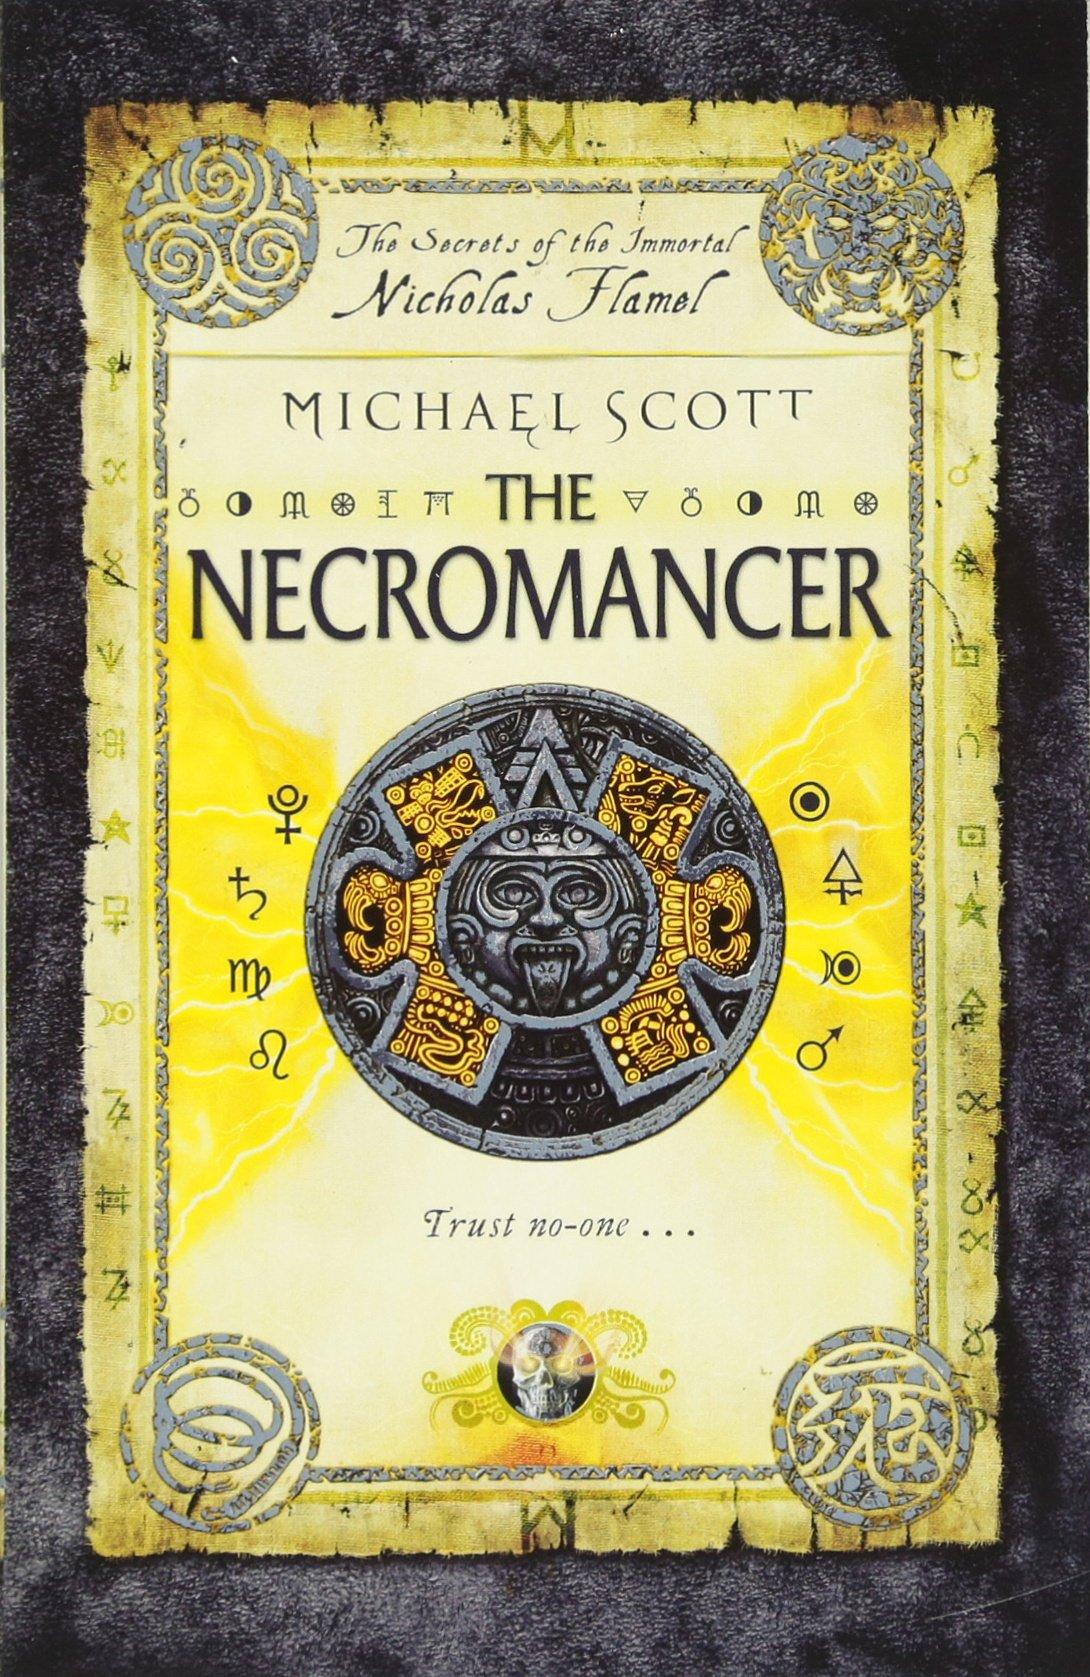 The Necromancer: Book 4 (the Secrets Of The Immortal Nicholas Flamel):  Amazon: Michael Scott: 9780552561969: Books